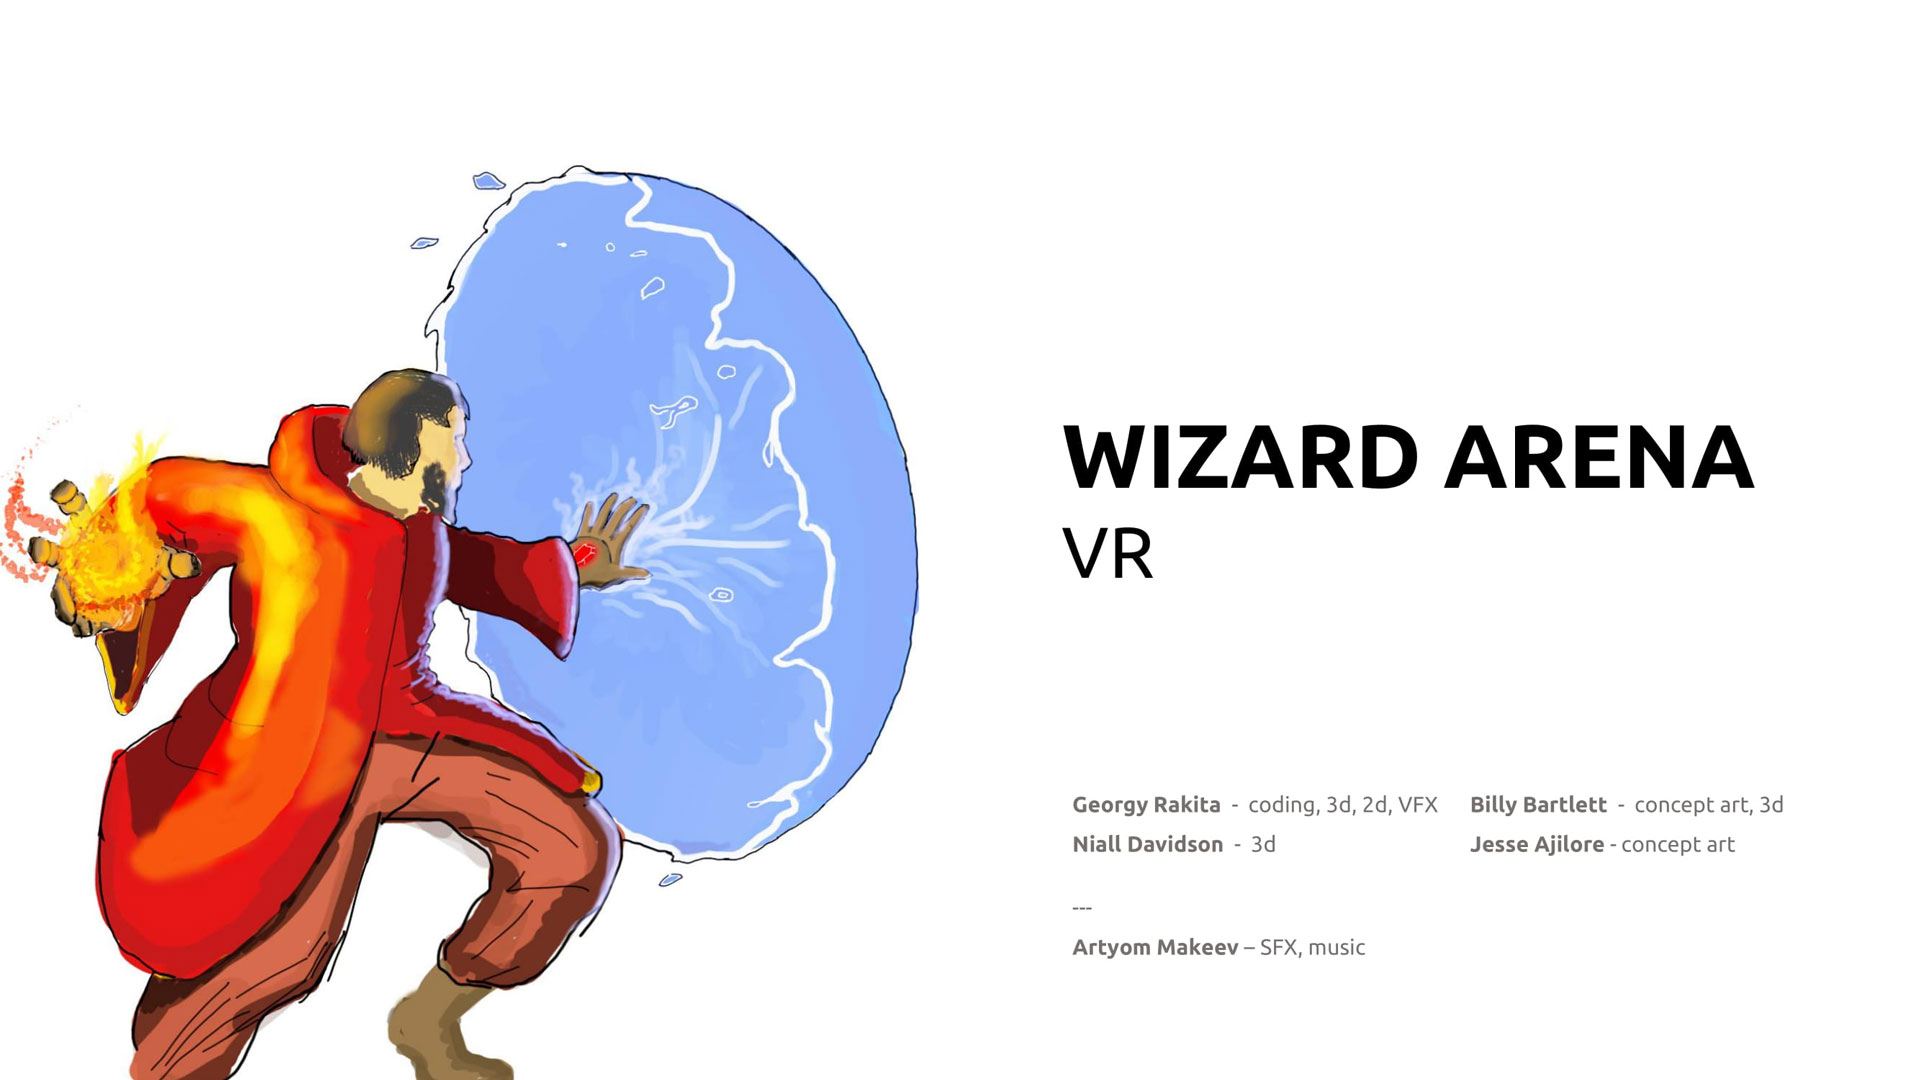 Wizard Arena VR